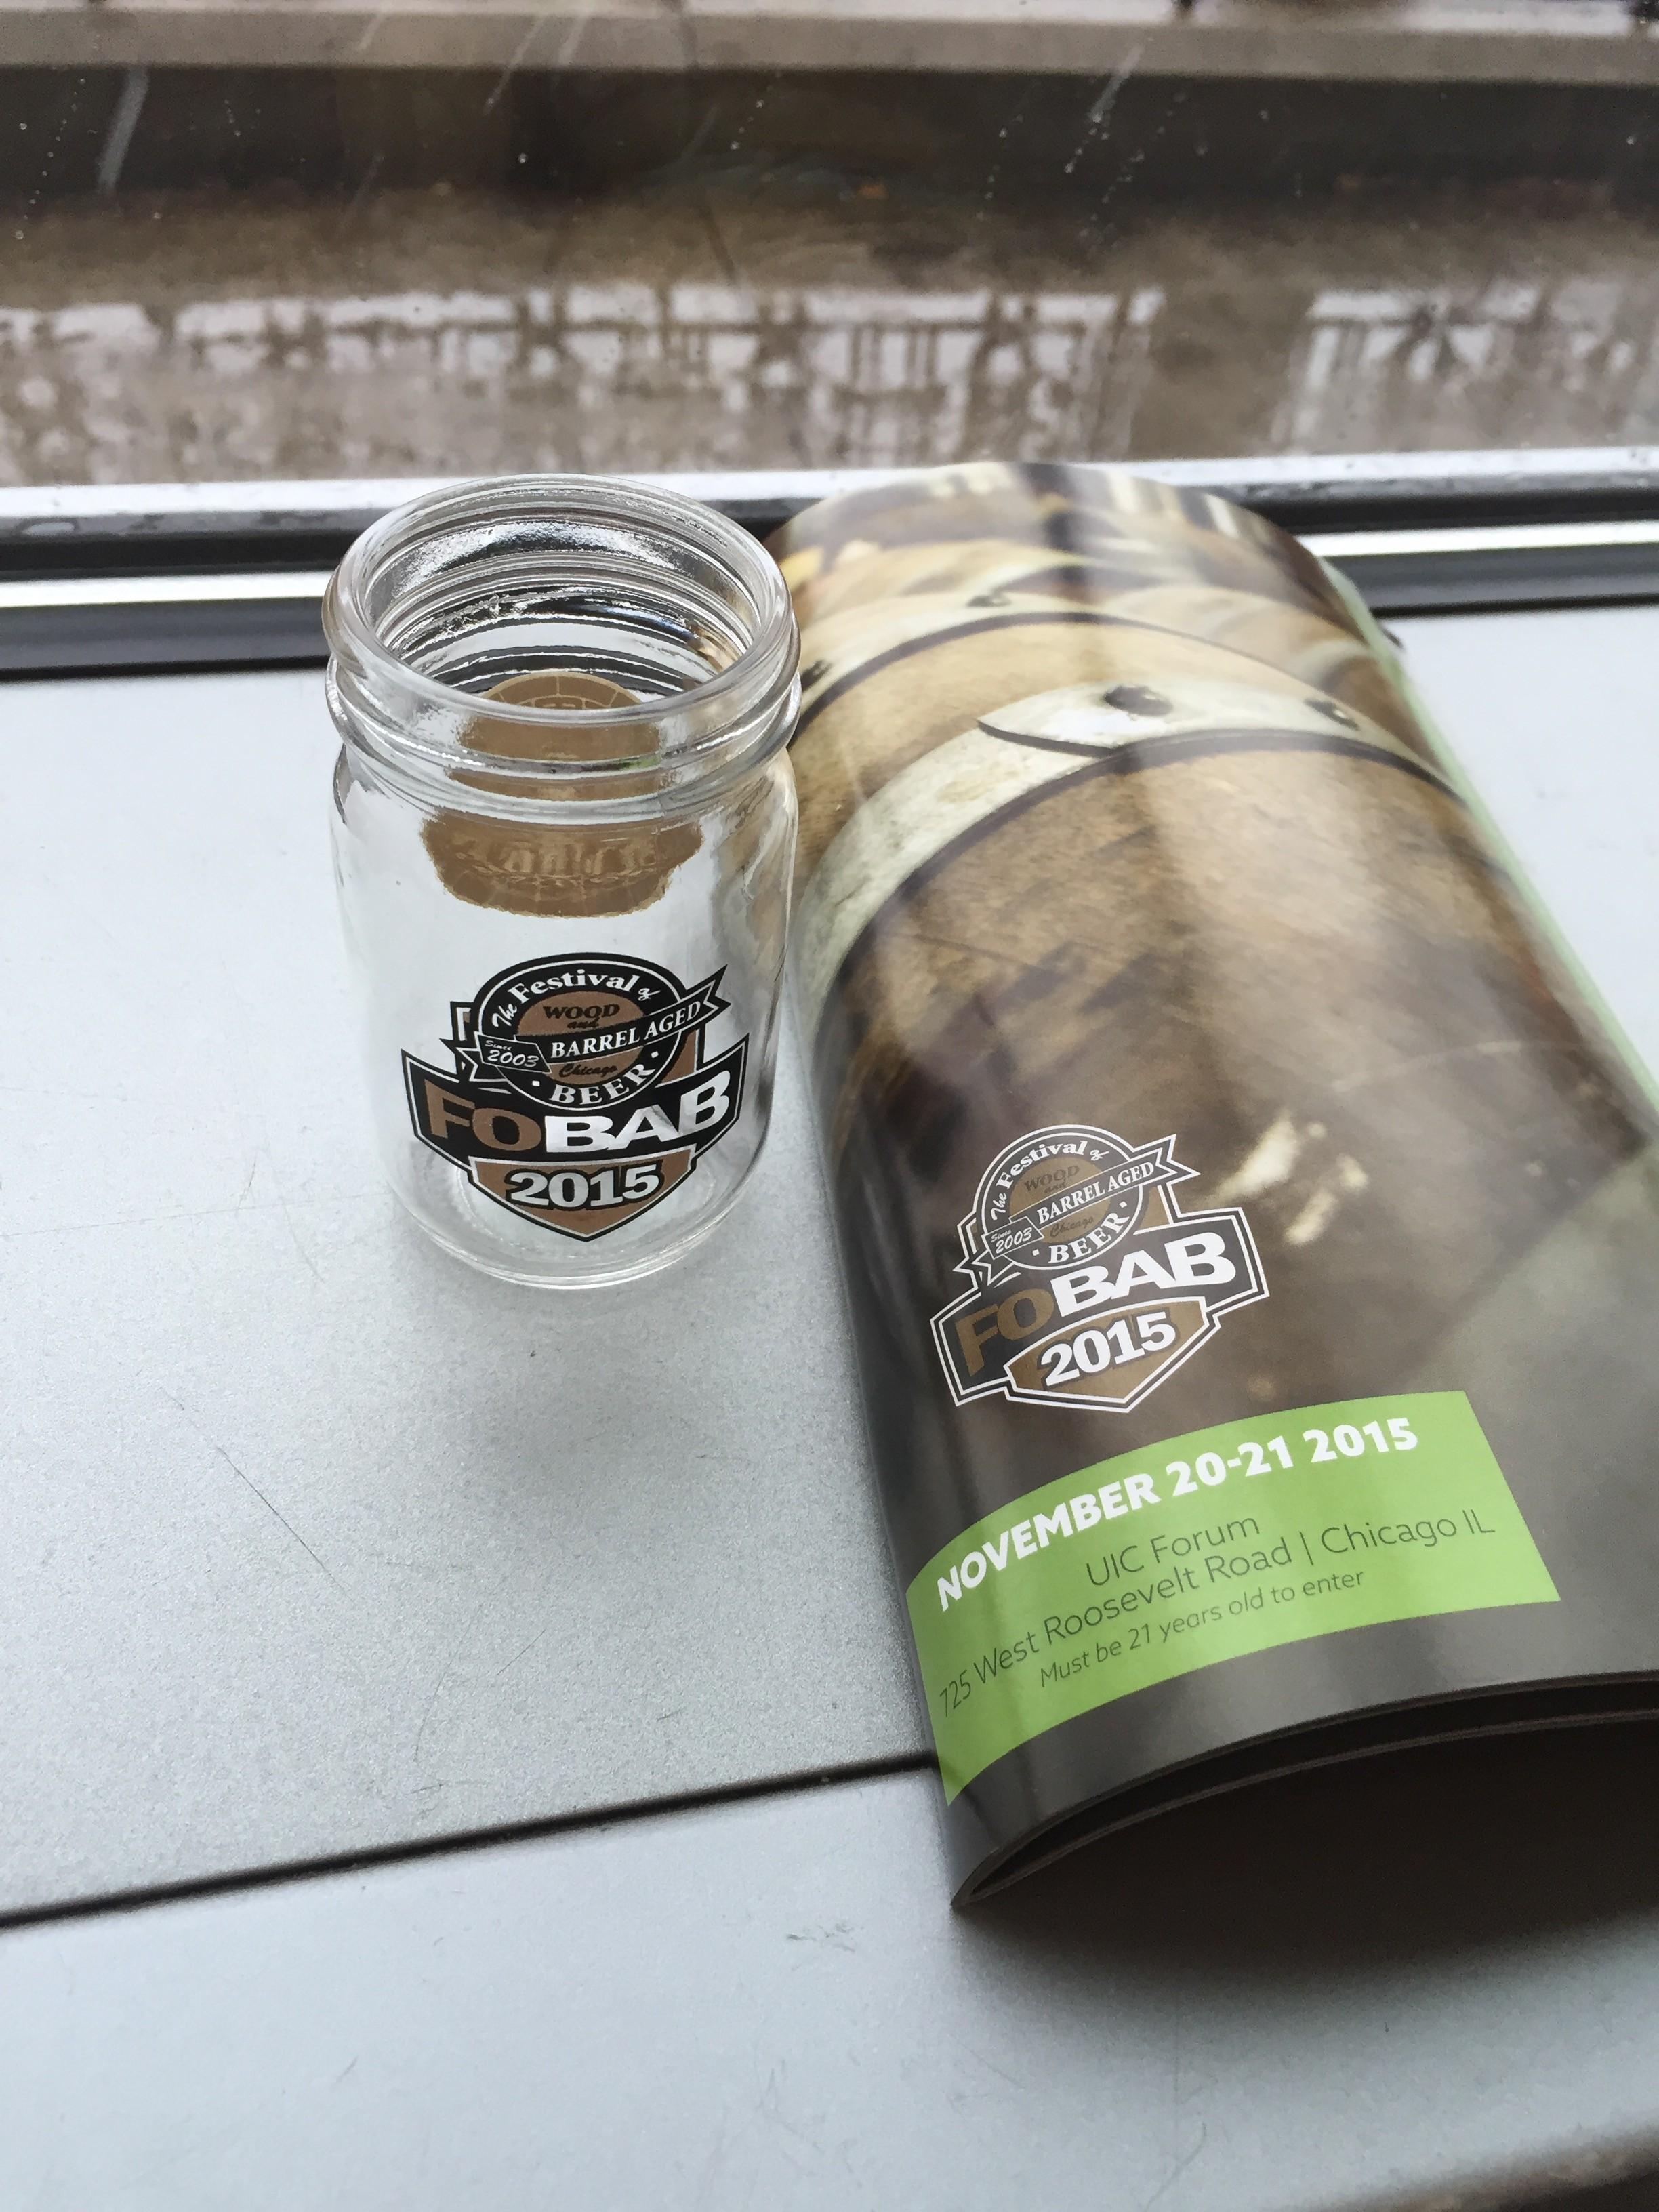 This year's tasting glass was a mini mason jar.